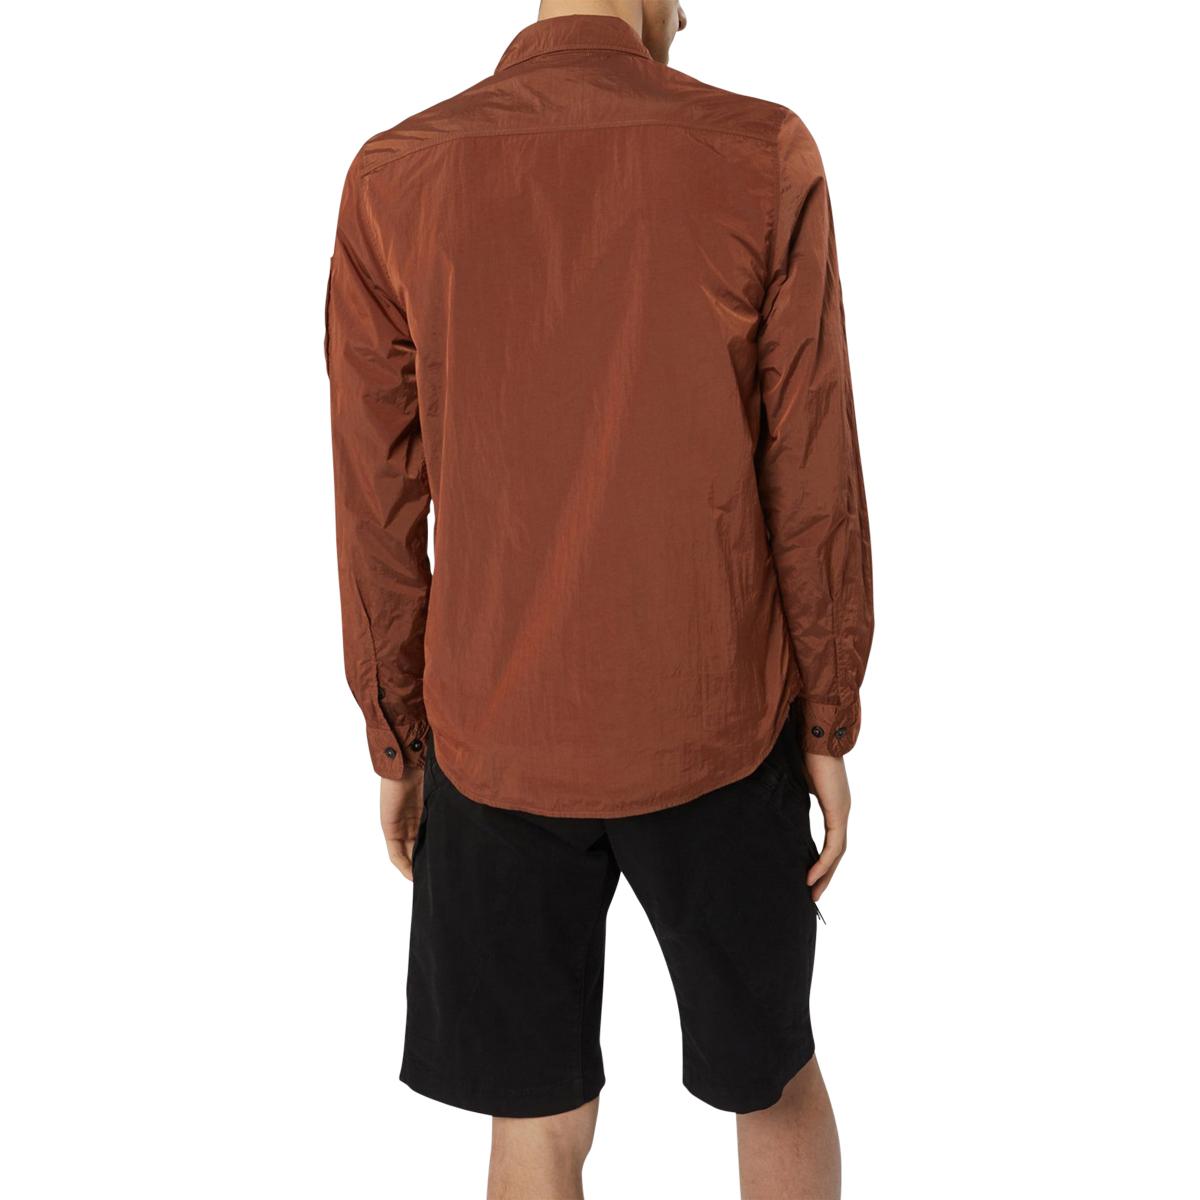 CP Company CR-L Zip-up Shirt